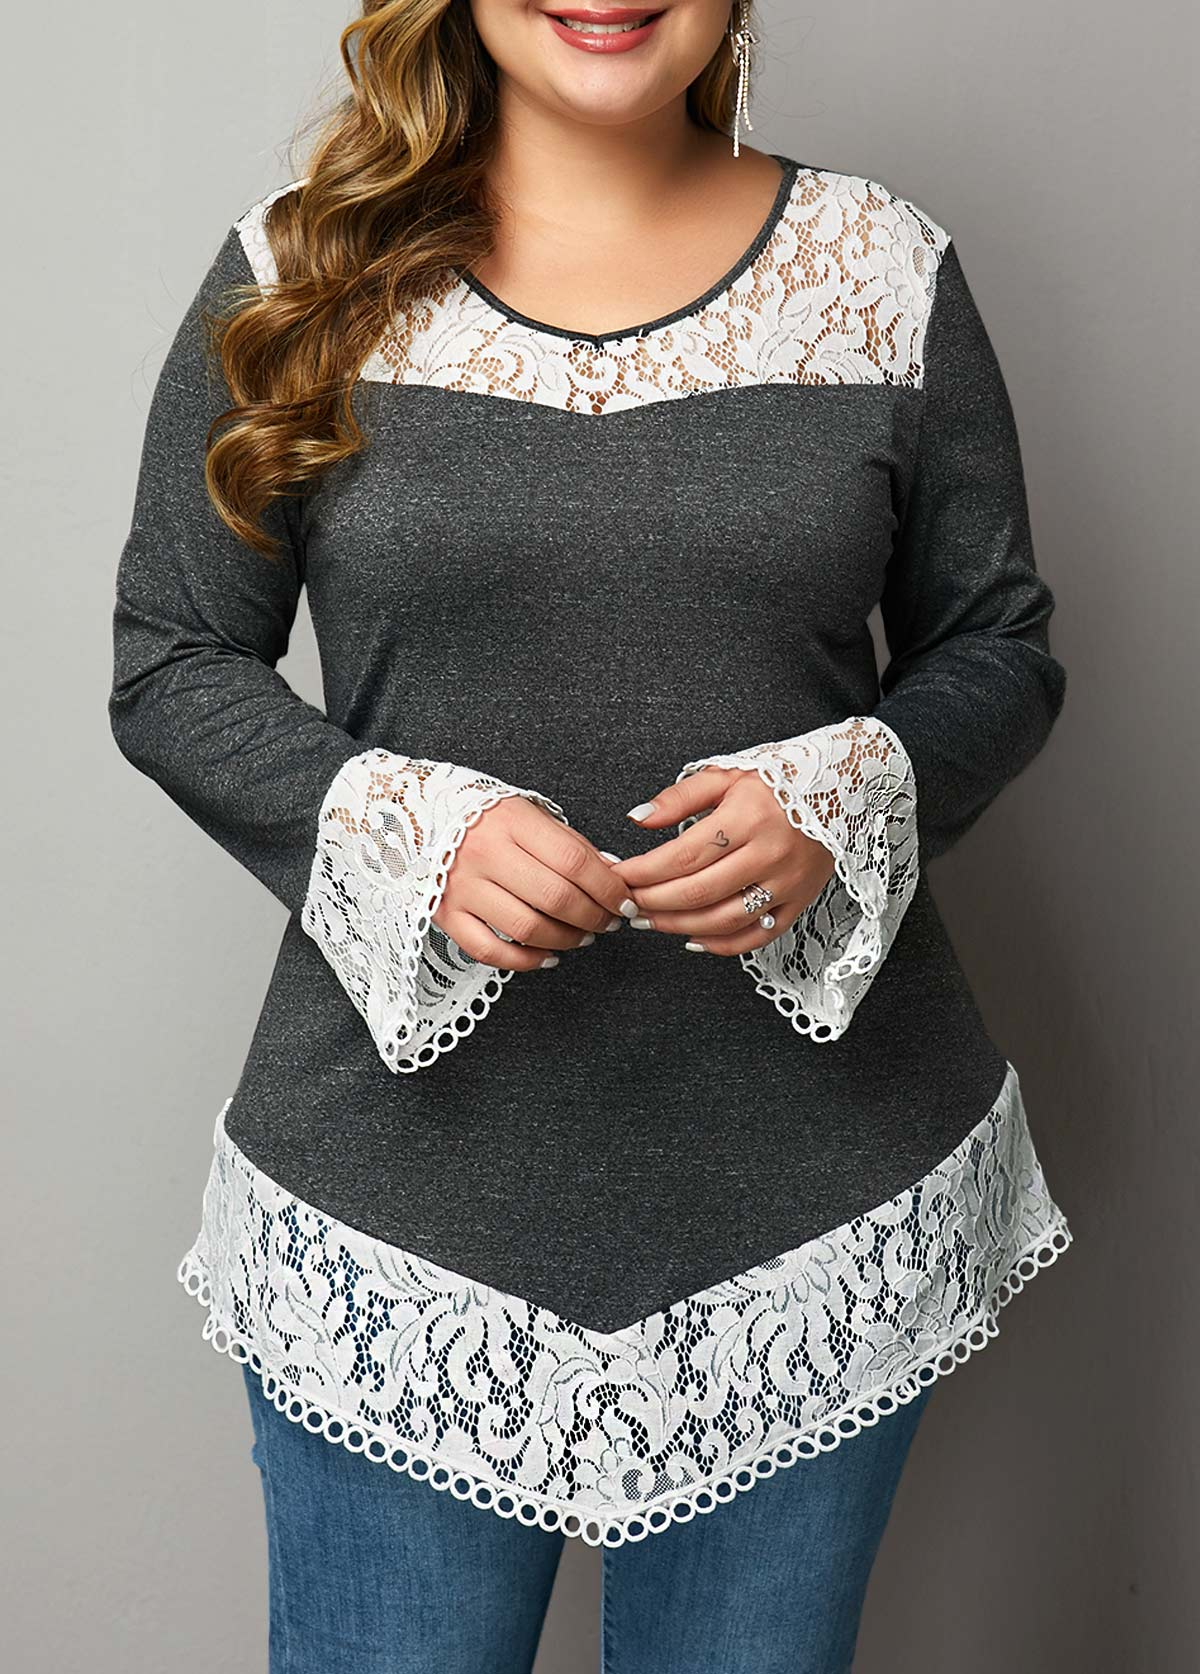 ROTITA Lace Patchwork Plus Size Flare Sleeve T Shirt